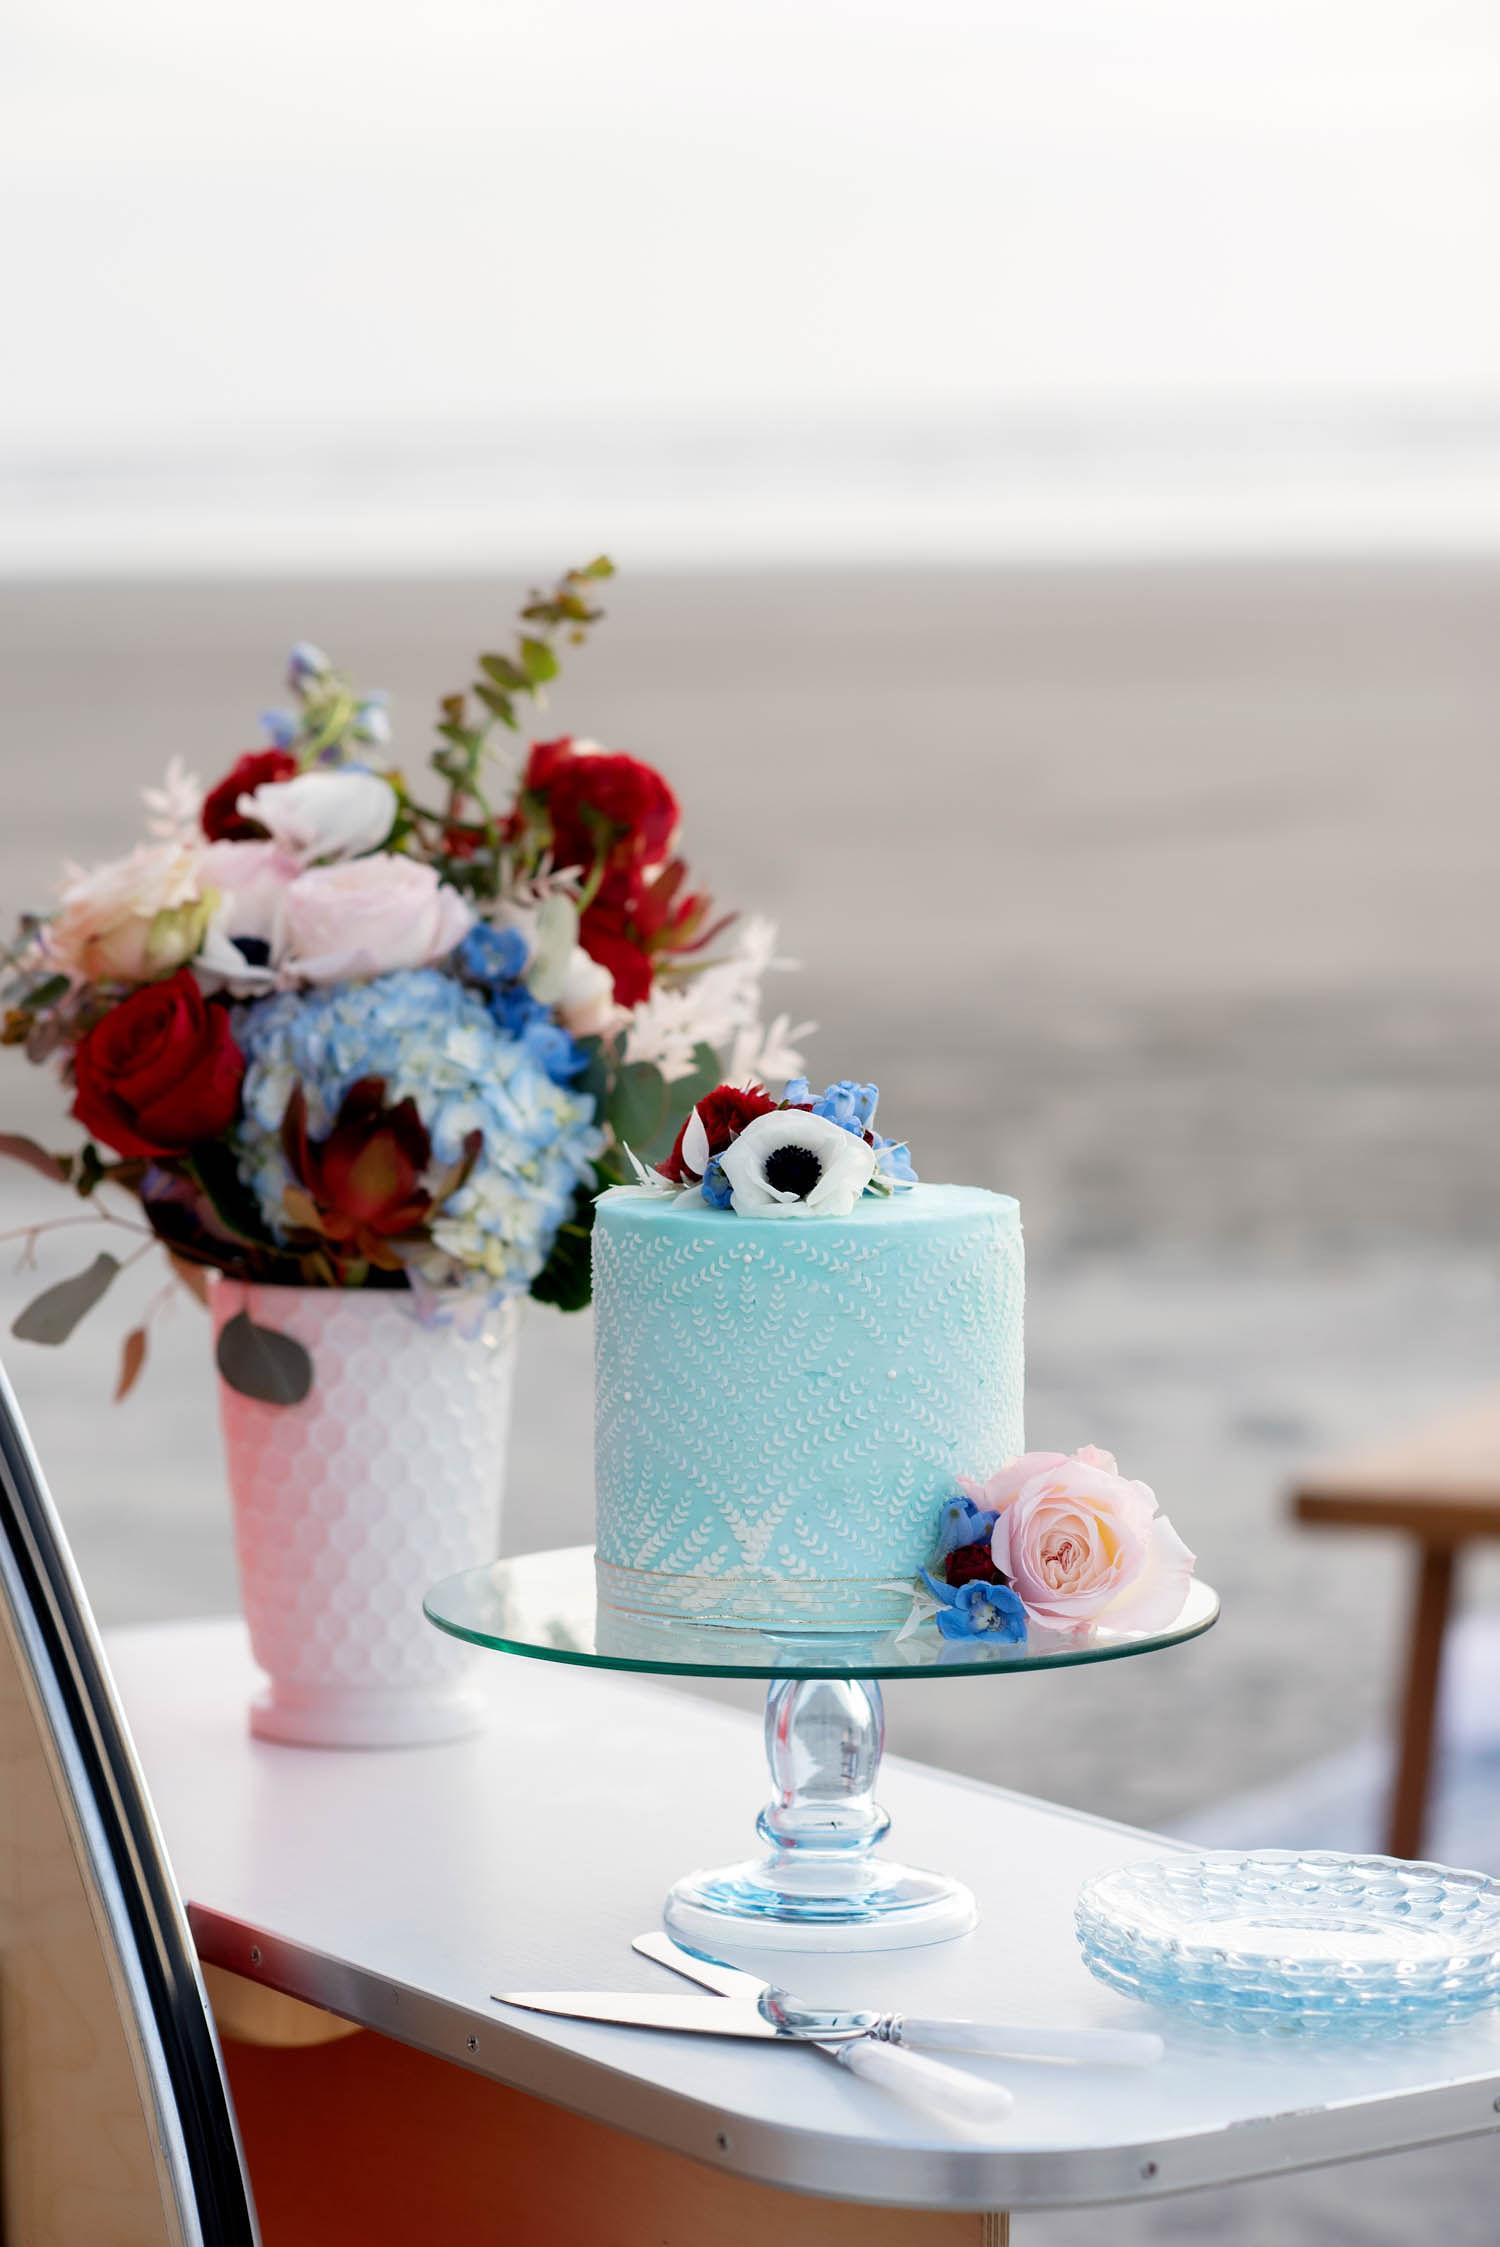 oregon wedding cake, wedding cake, wedding flowers, bridal bouquet, oregon wedding flowers, oregon wedding florist, portland wedding florist, portland wedding flowers,